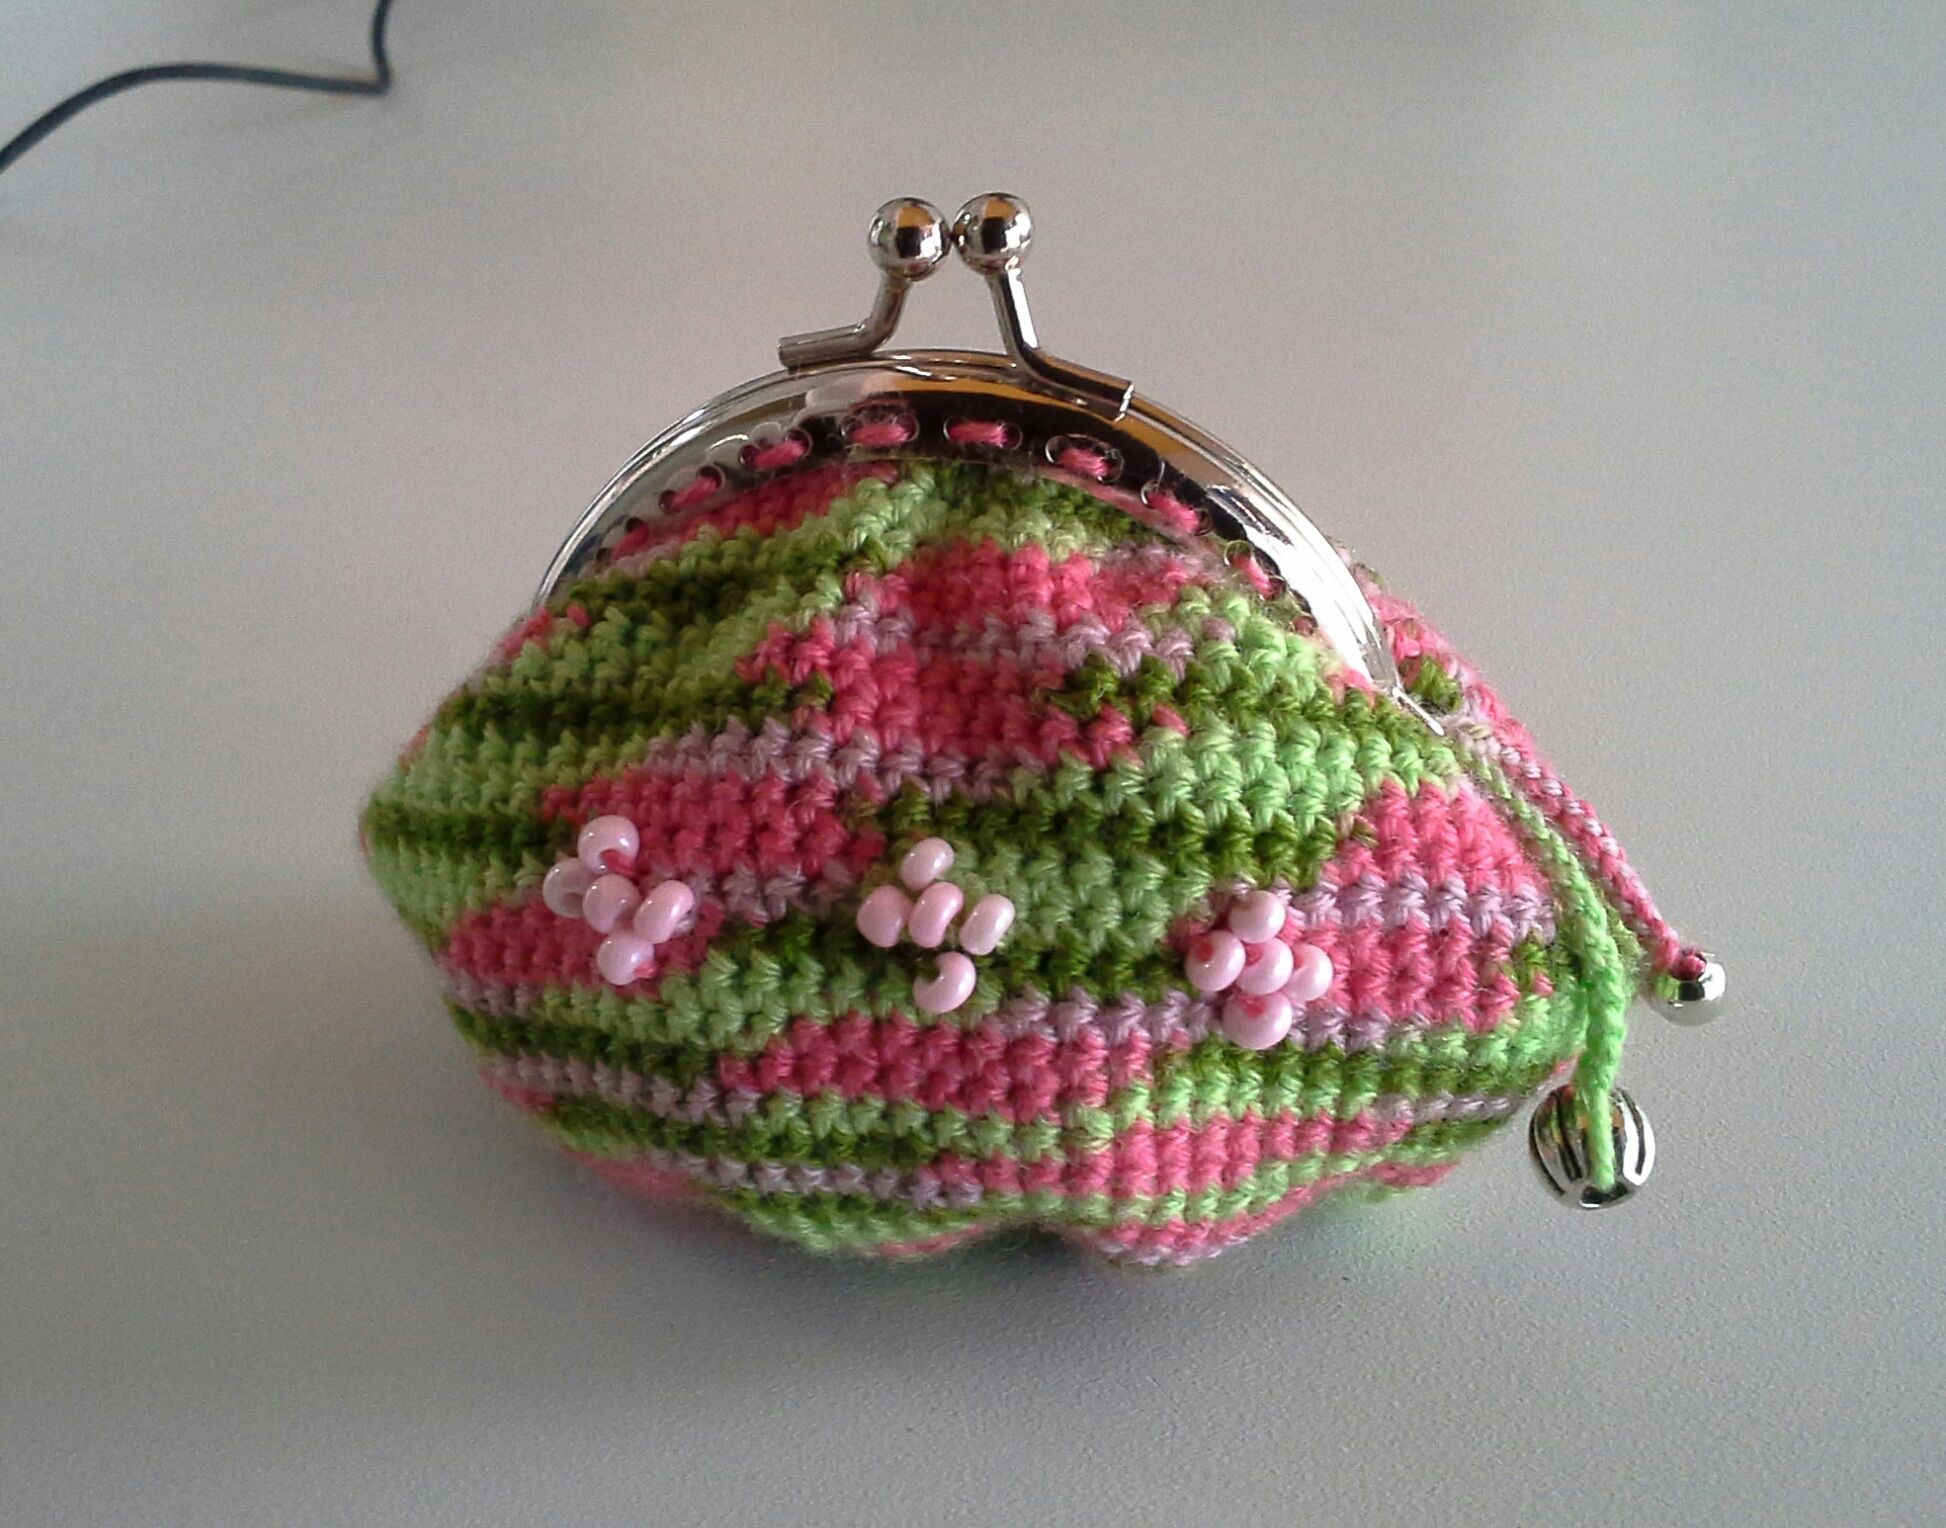 Monedero Para Celia Monederos Ganchillo Crochet Purses Pinterest - Monederos-ganchillo